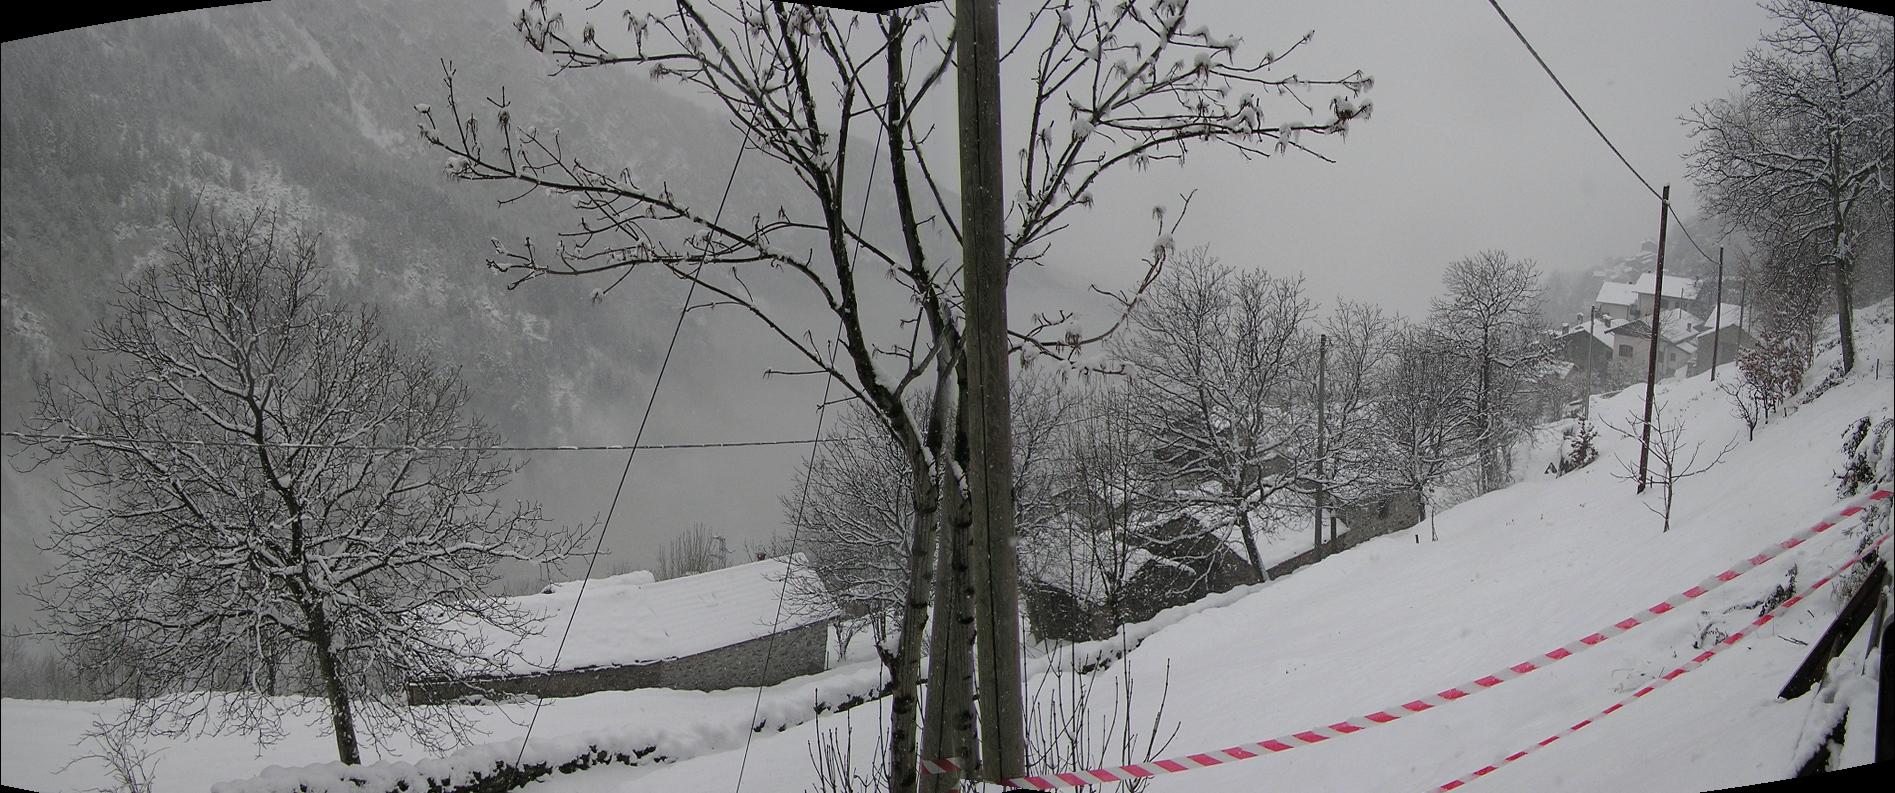 Nowcasting Valtellina, Valchiavenna Valsassina e alto Lario 5/1/08-050108.jpg